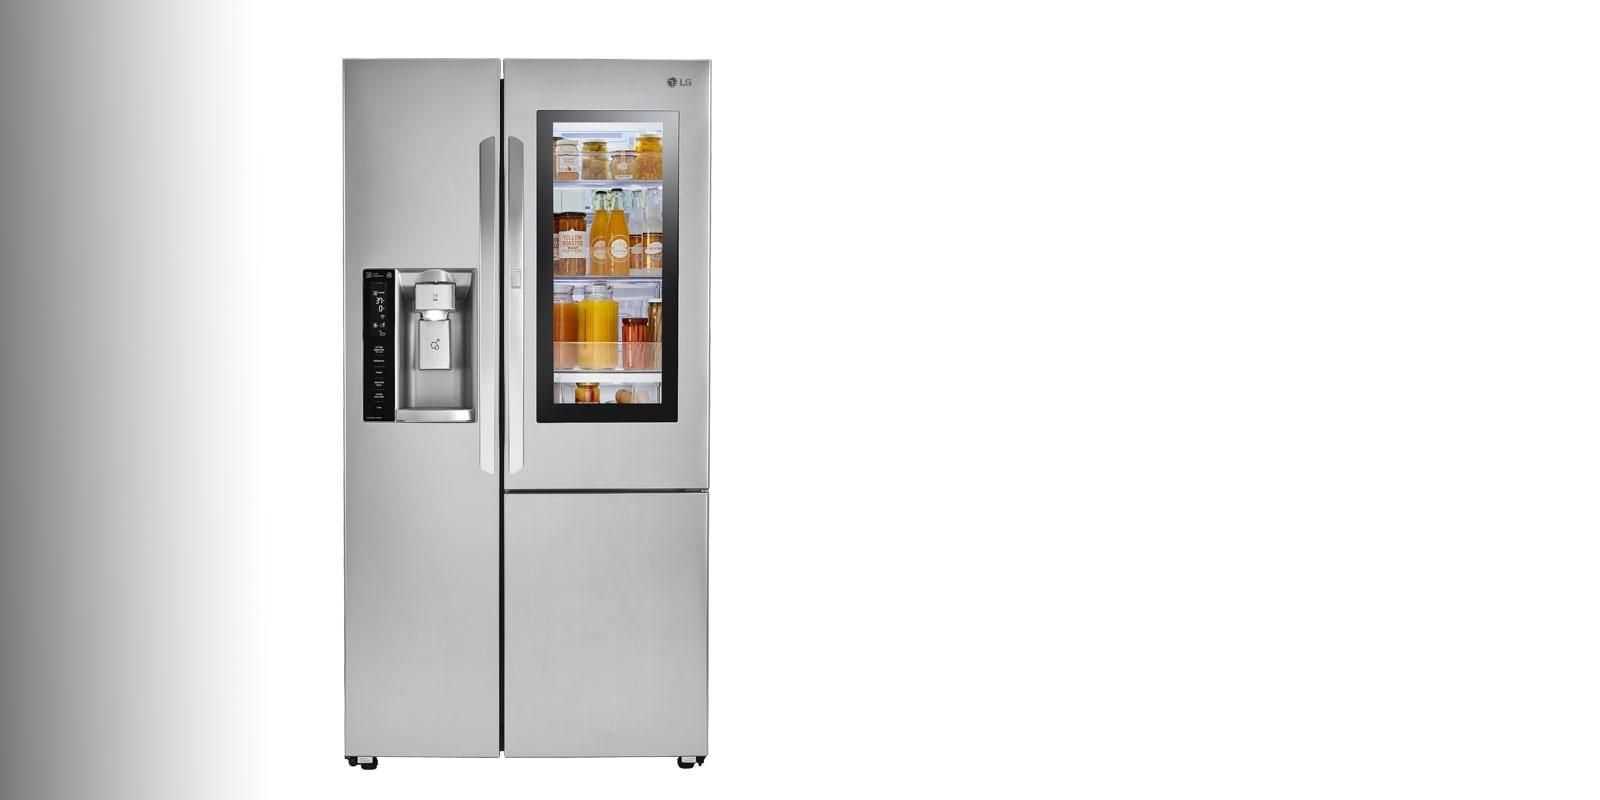 LG Side By Side Refrigerators & Built-In Fridge | LG Canada